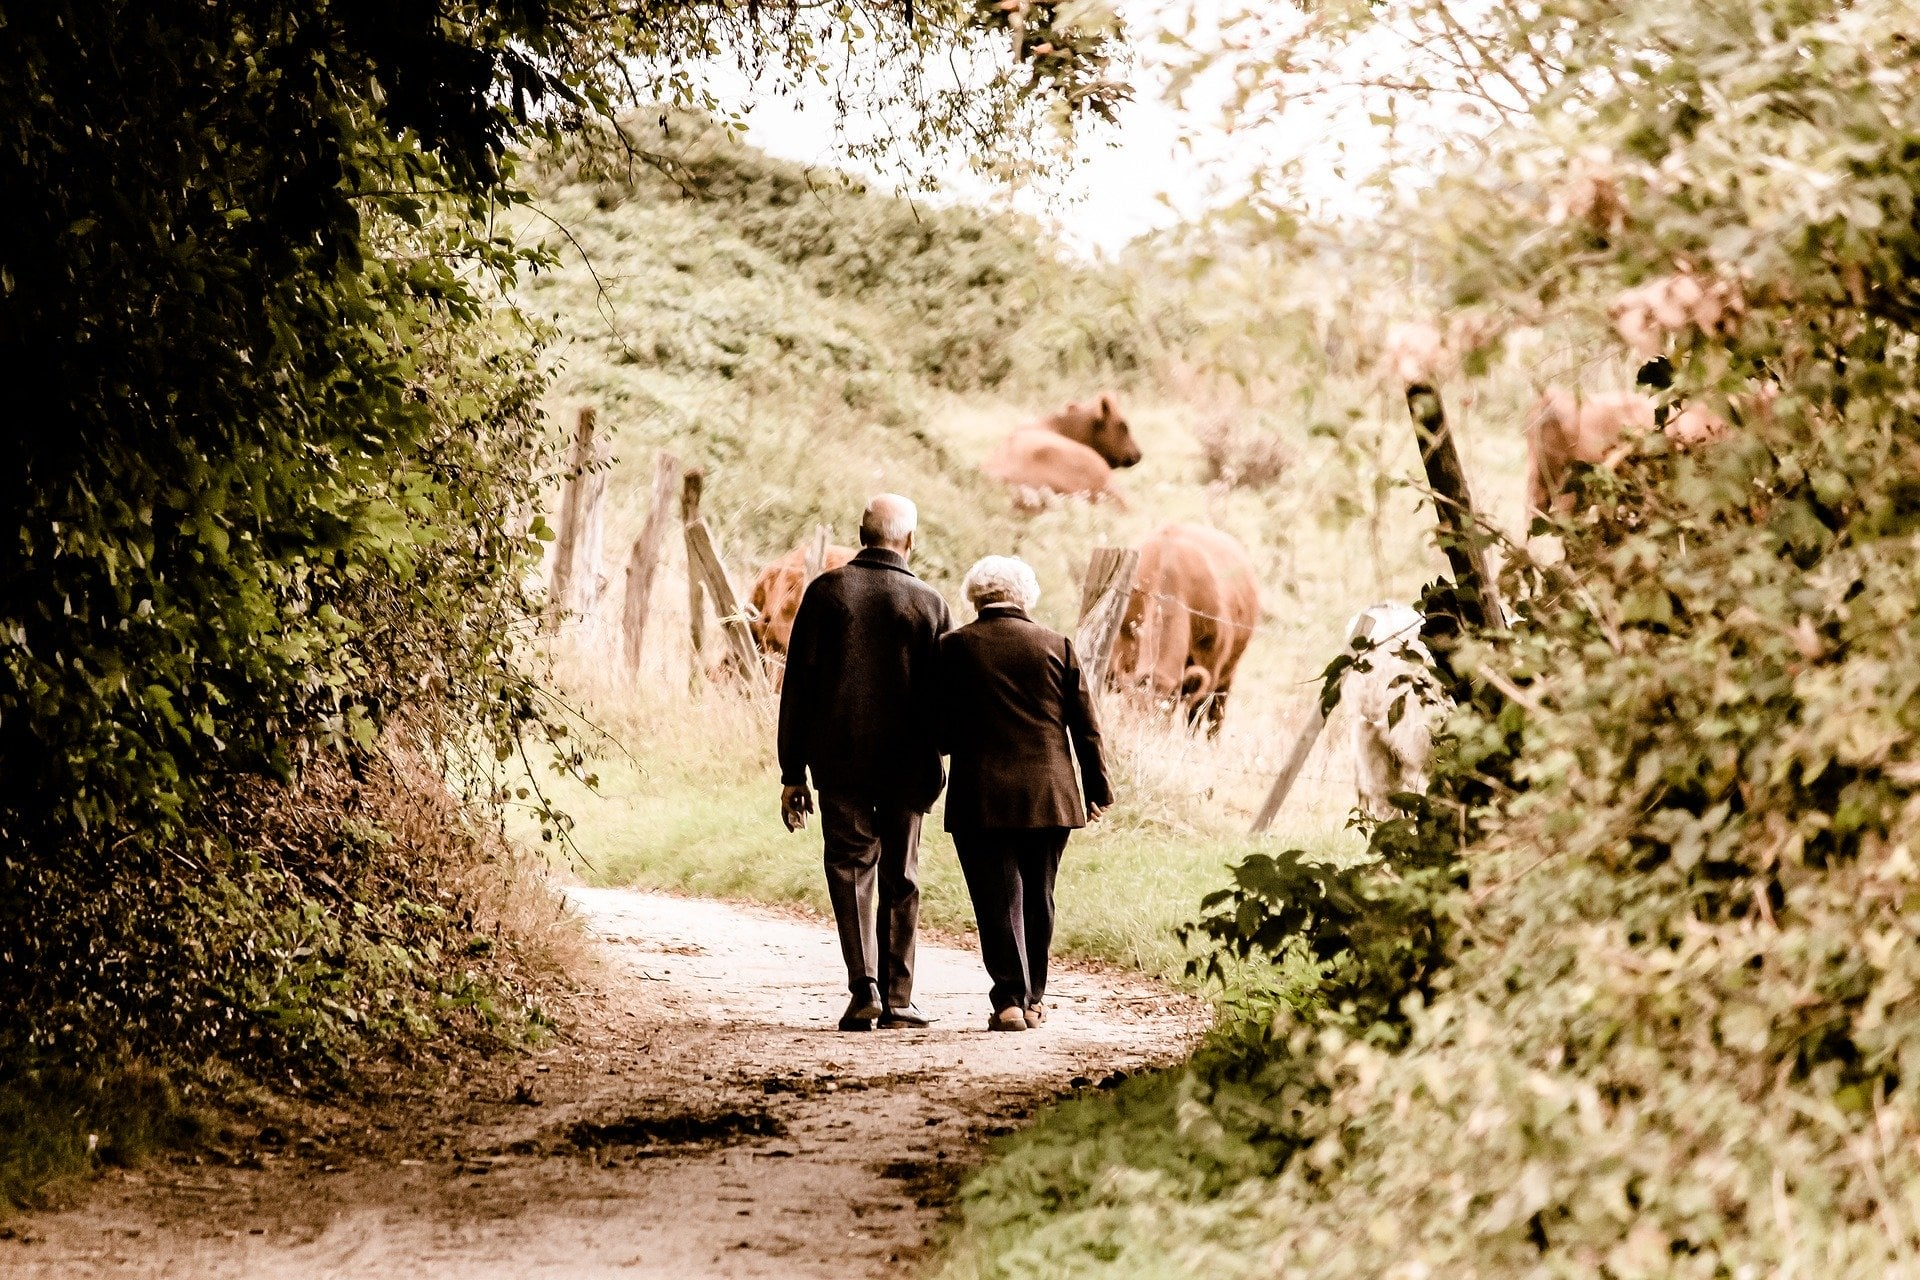 bild anwendungsgebiet gps tracker senioren